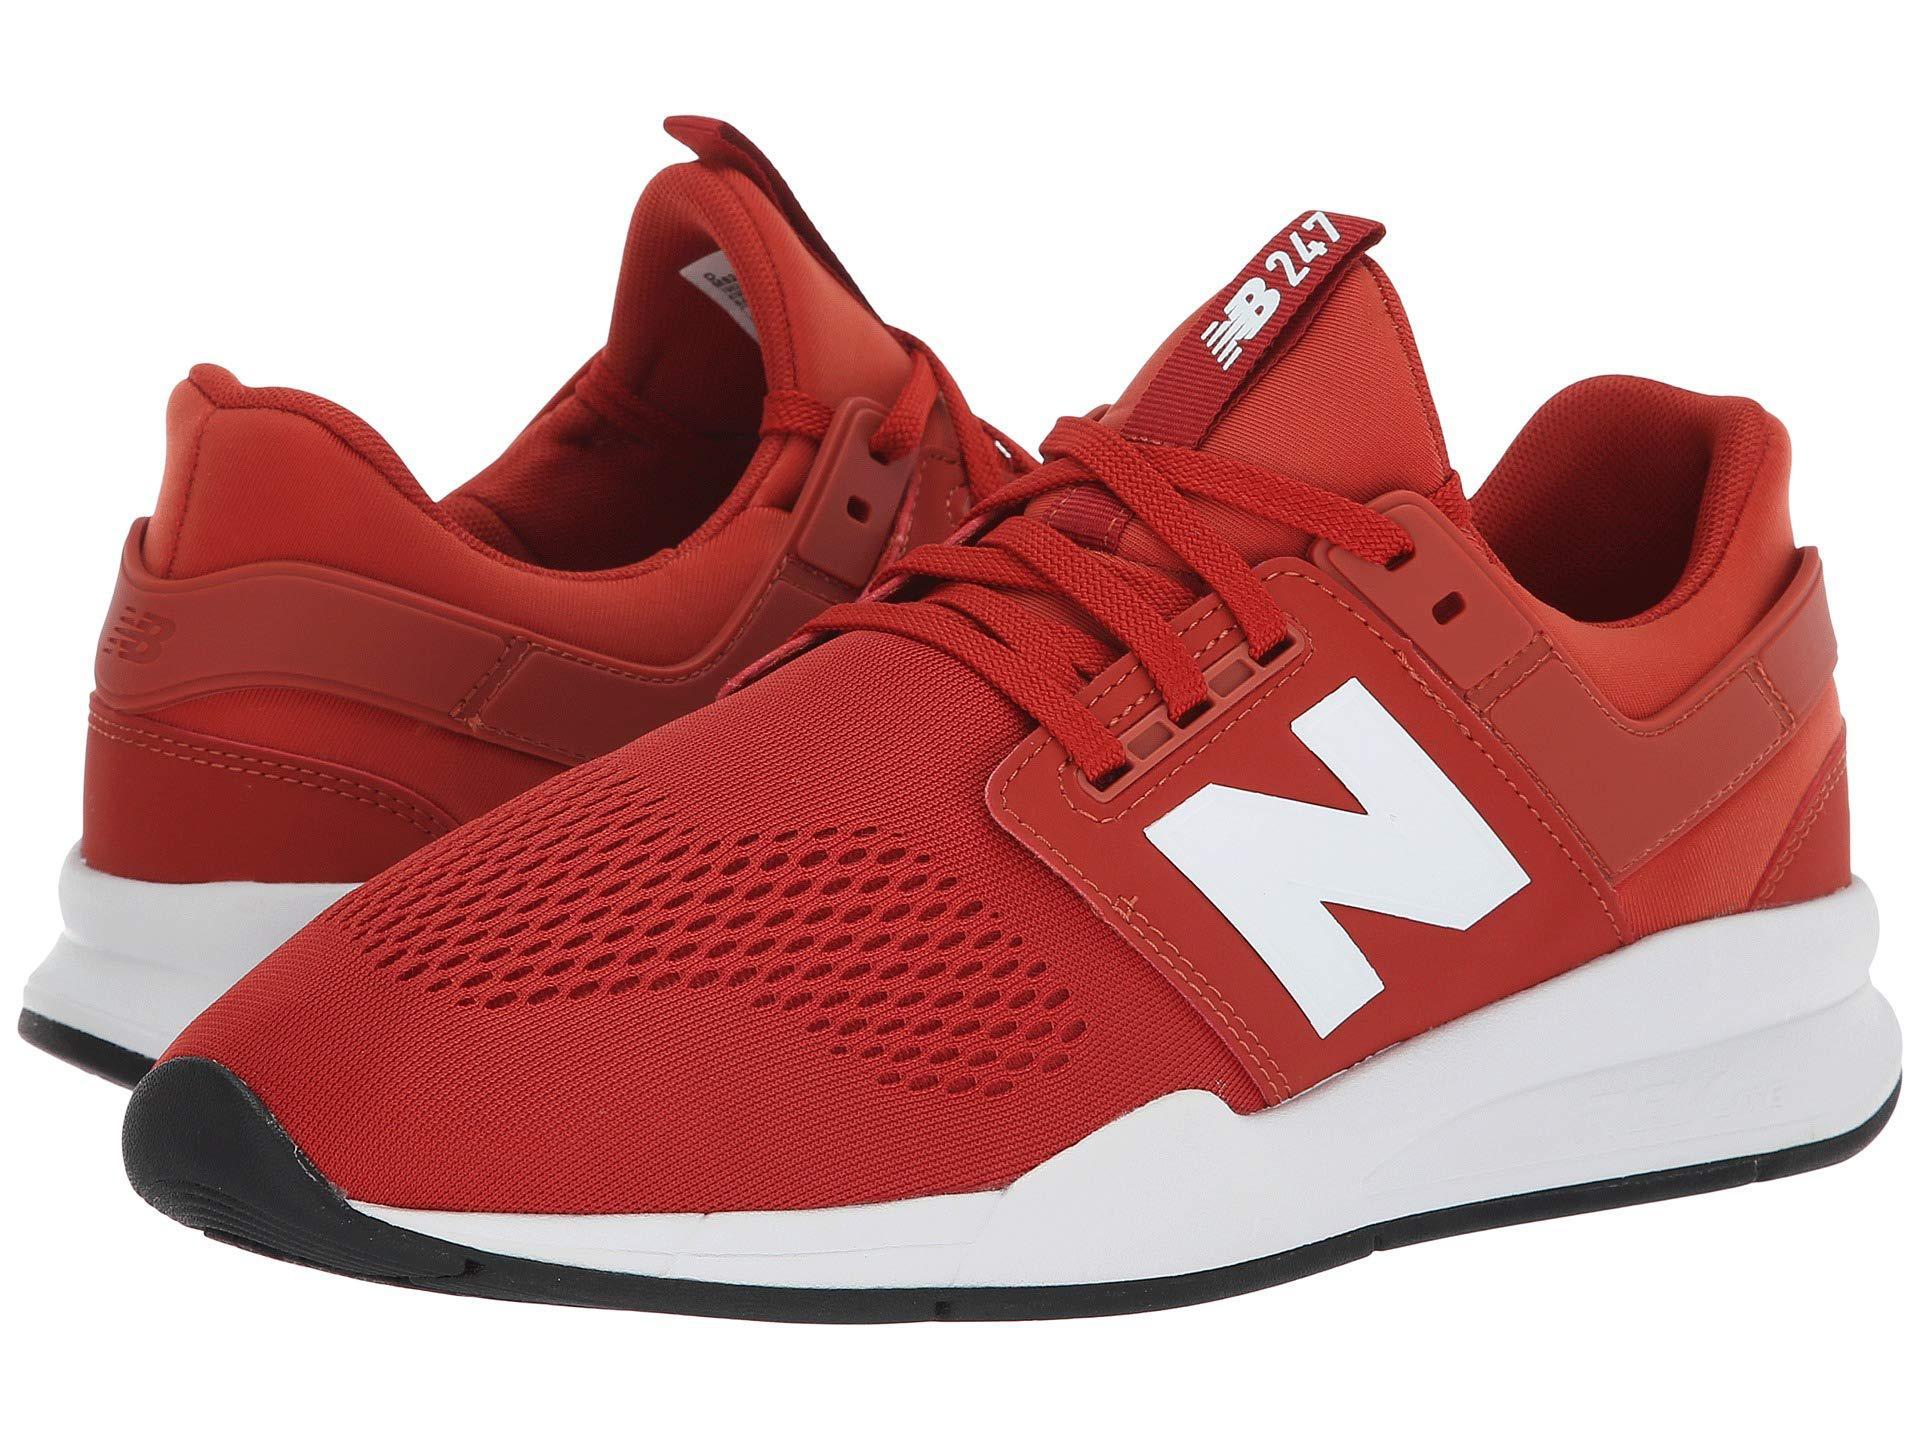 new arrival 66195 f5793 Lyst - New Balance 247v2 Sneaker in Red for Men